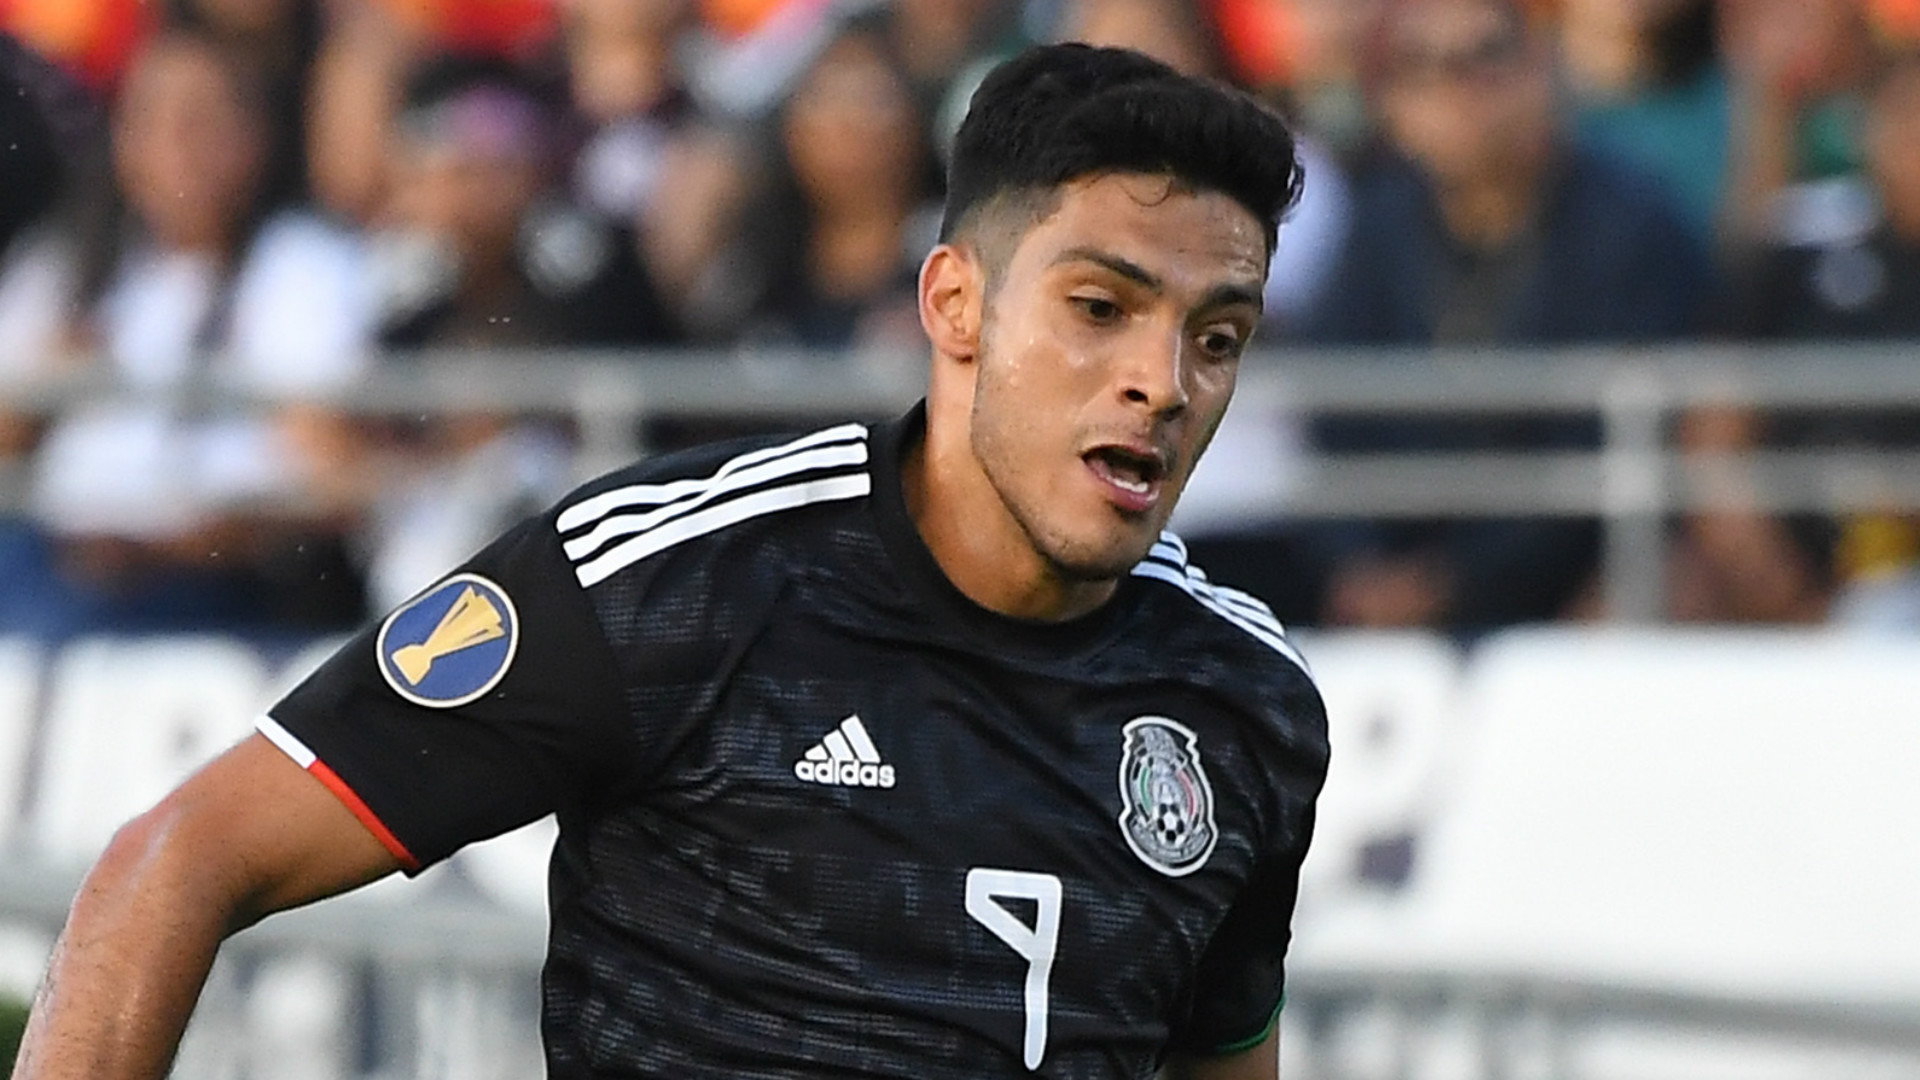 Martinez scores hat-trick as Argentina hammer Mexico 4-0